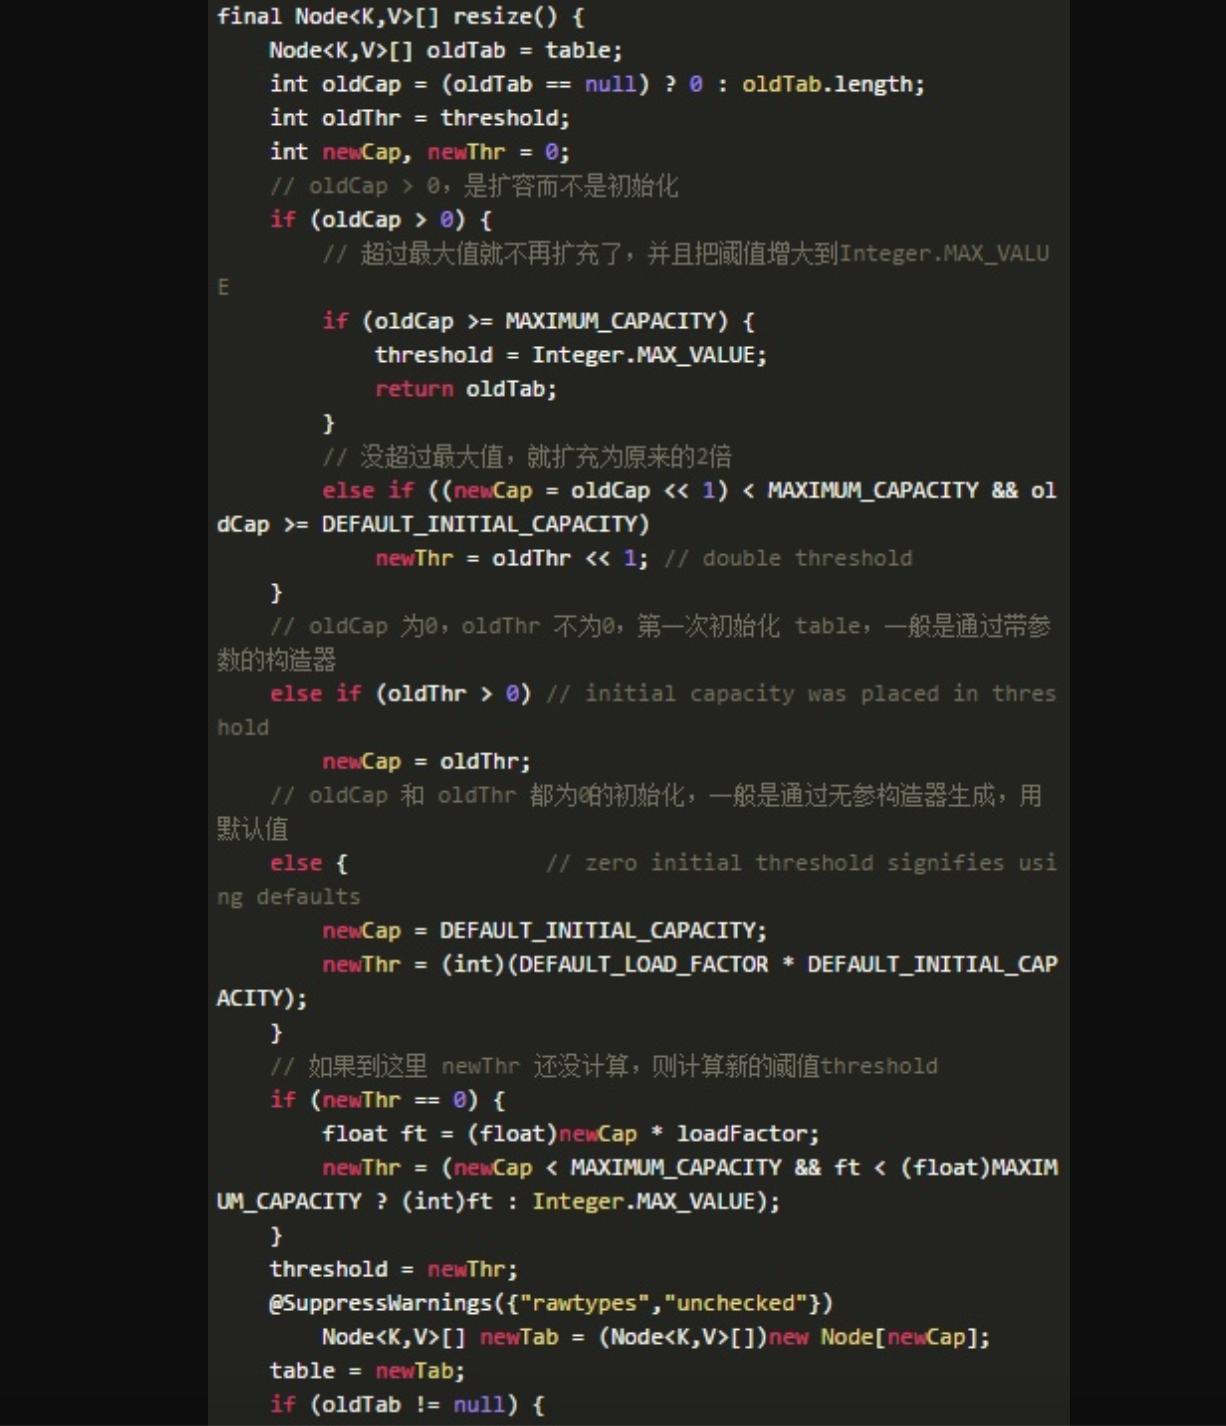 jdk8-resize-code-1